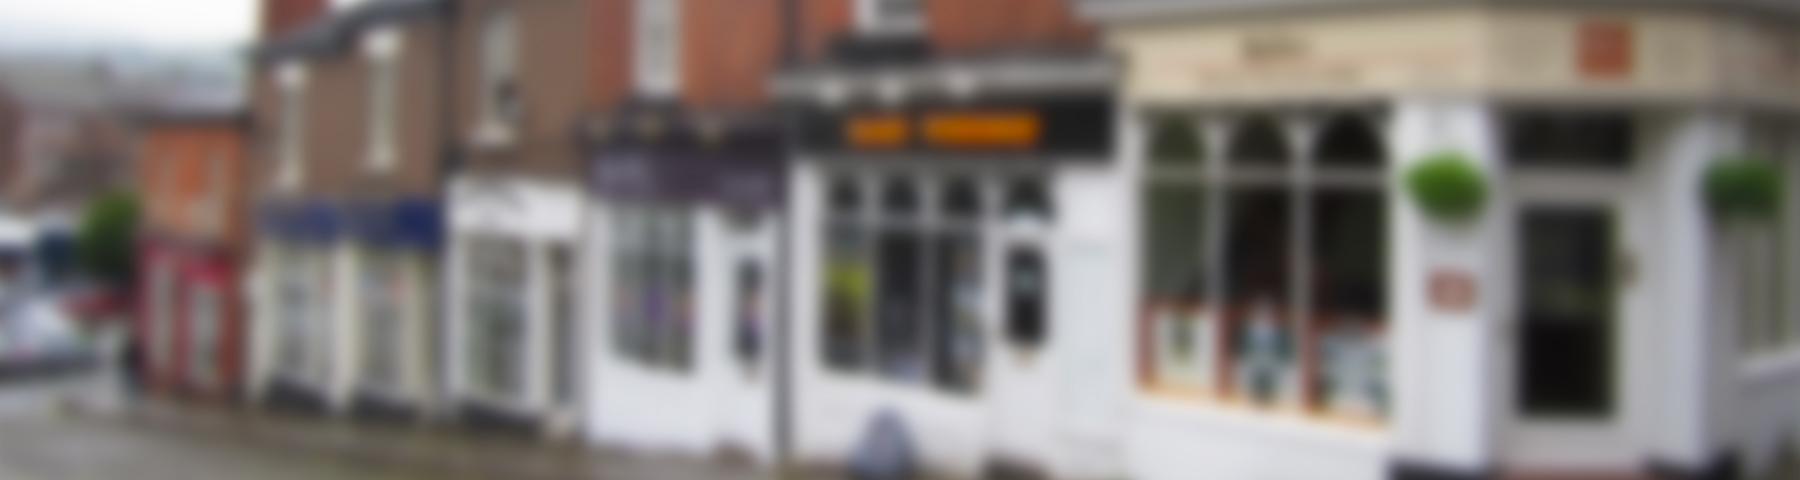 macclesfield-banner-bg